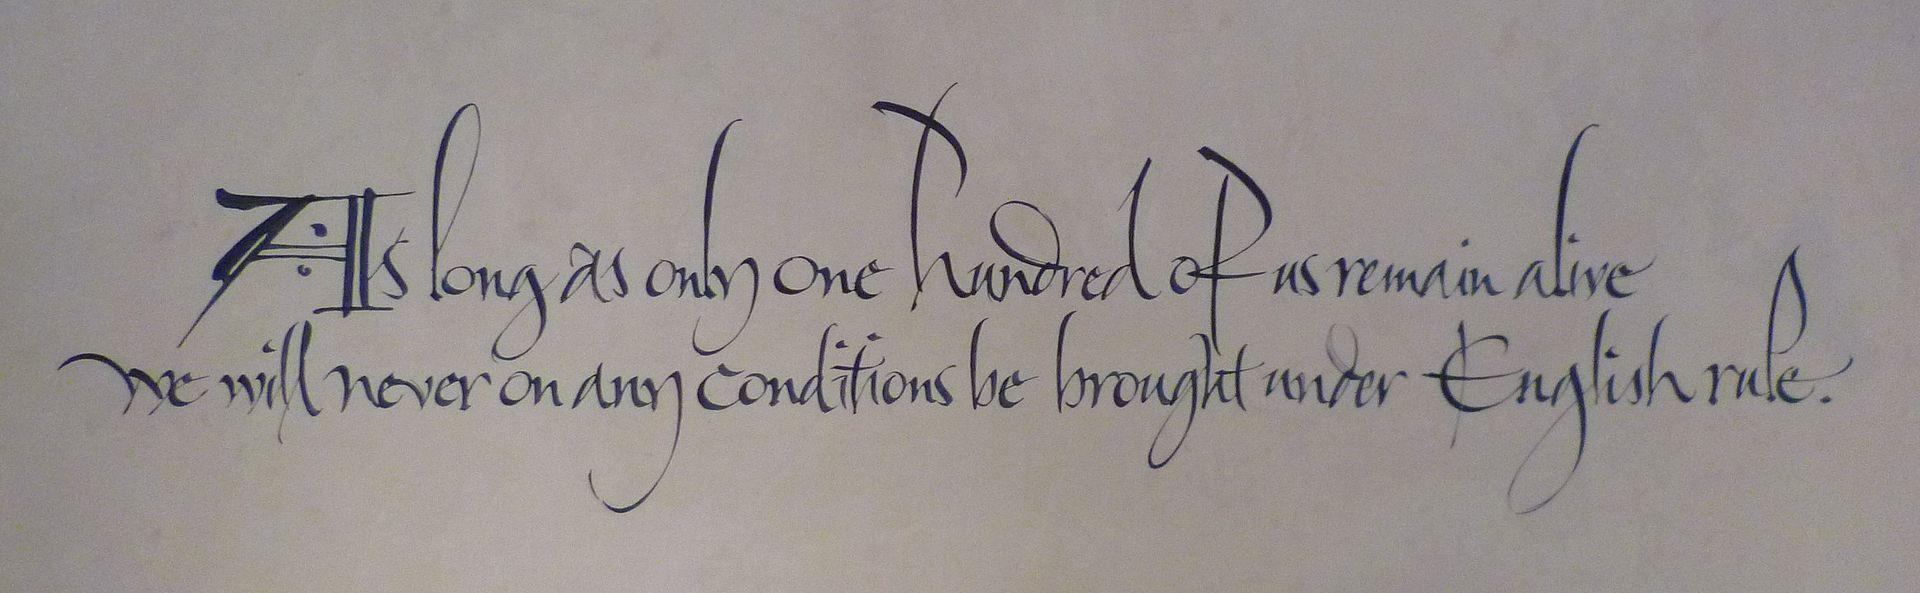 1920px-Declaration_of_Arbroath_translati